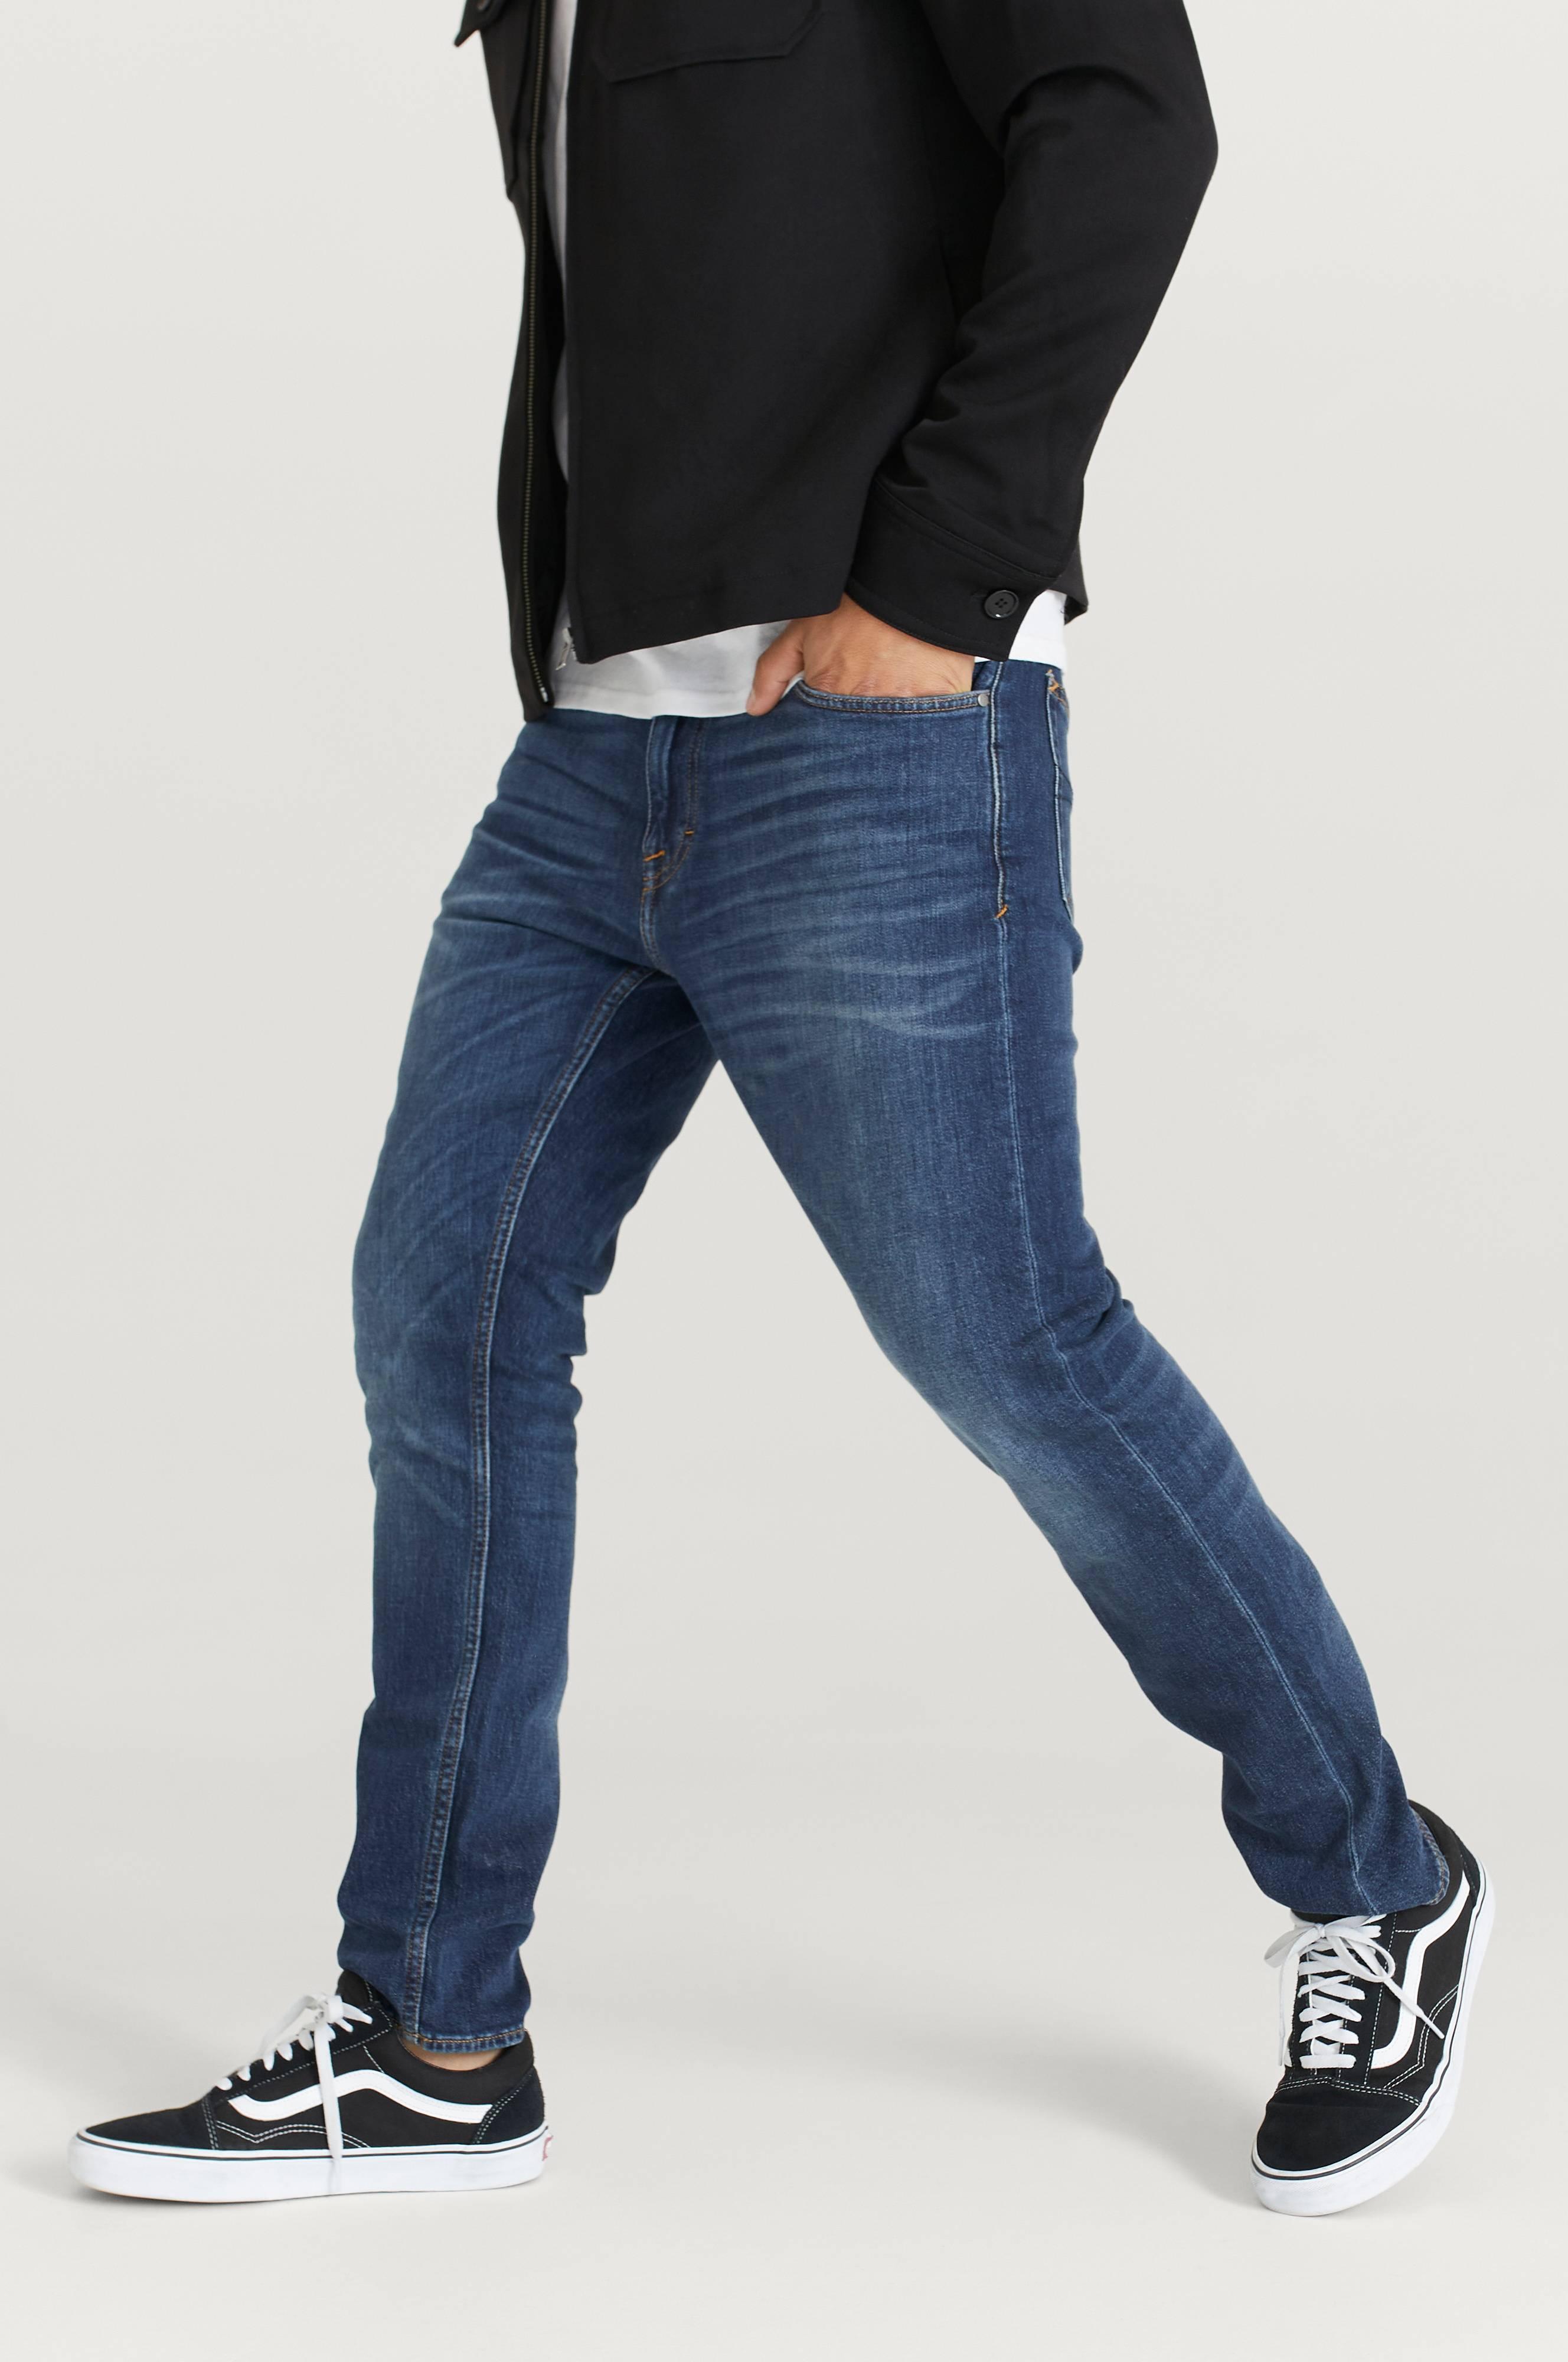 Tiger Of Sweden Jeans Pistolero Jeans Jeans Indigo